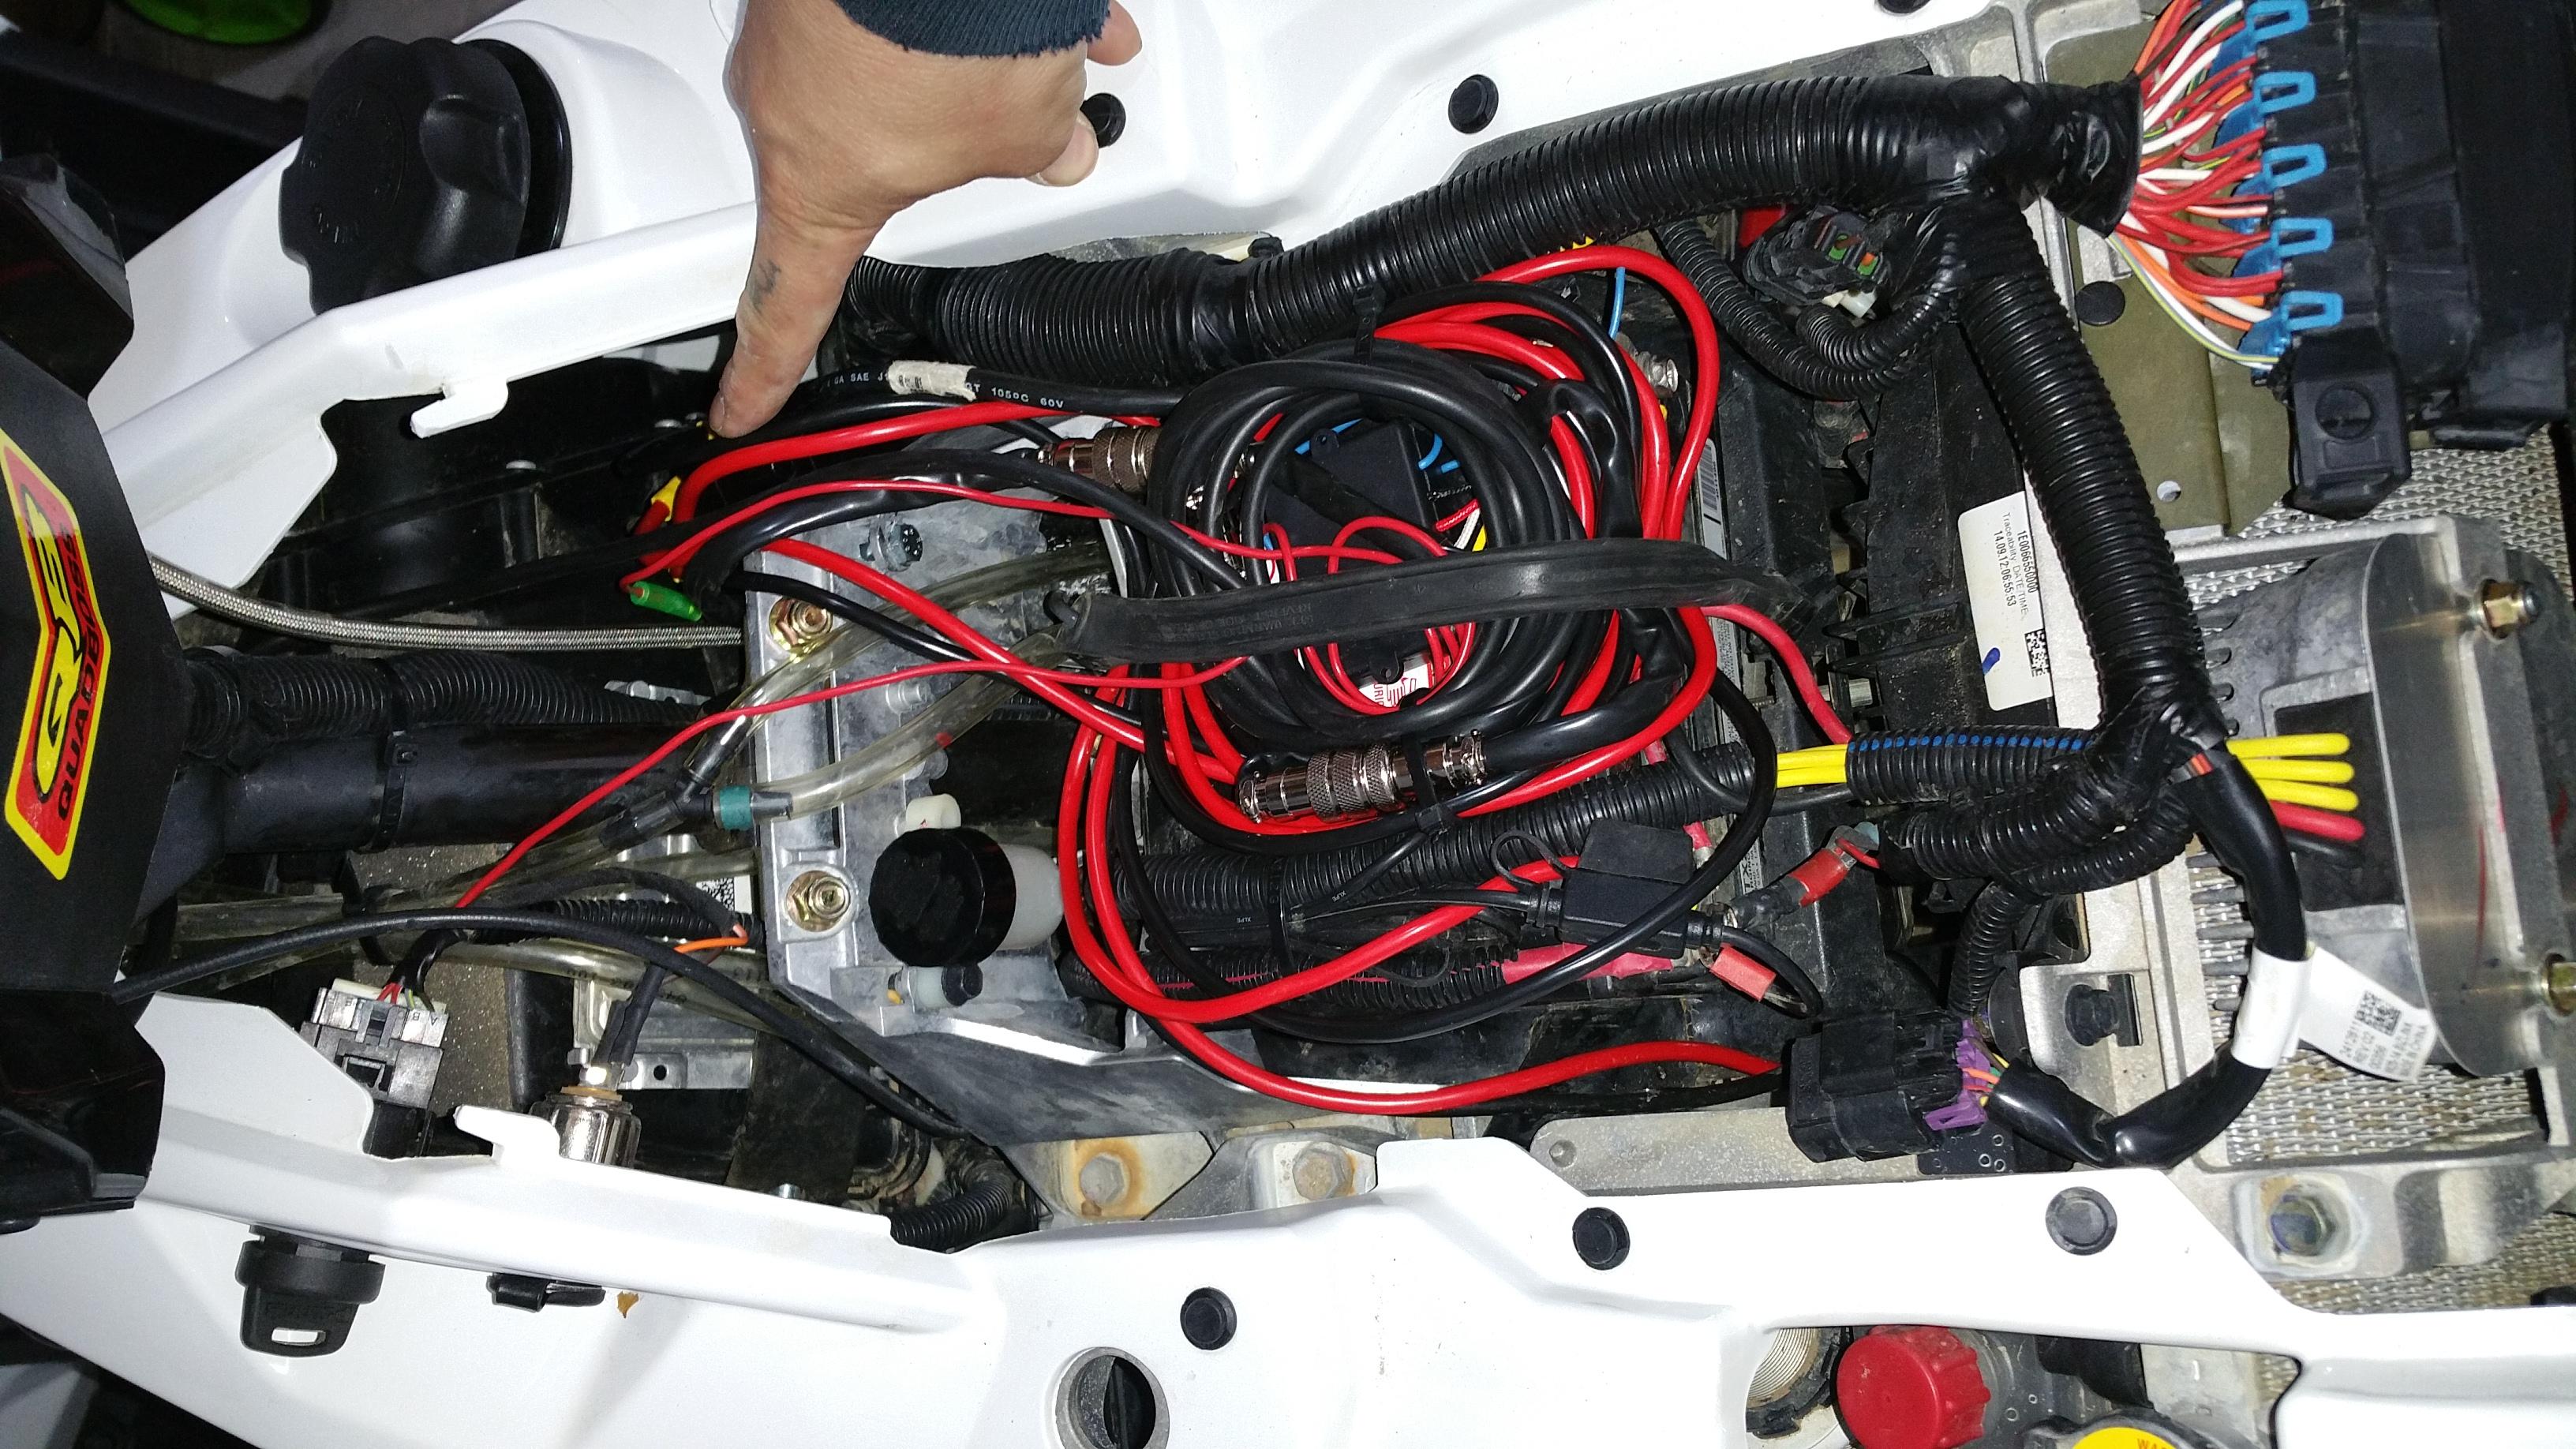 warn 2000 winch wiring diagram images forum superwinch 2000 warn a2000 atv winch wiring diagram image